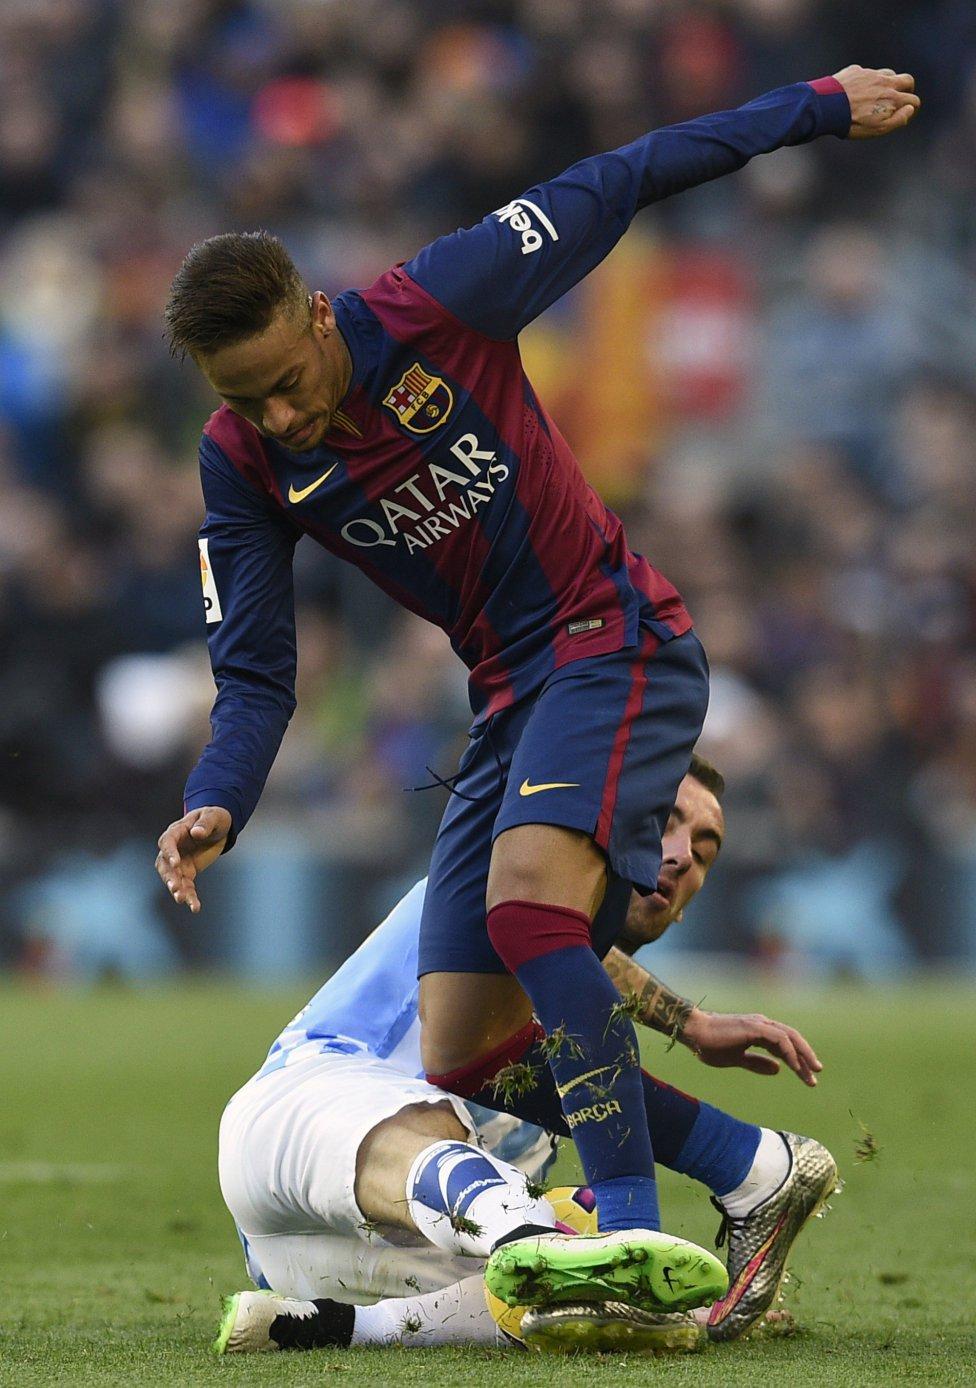 صور : مباراة برشلونة - ملقا  0-1 ( 21-02-2015 )  1424532480_739882_1424537939_album_grande